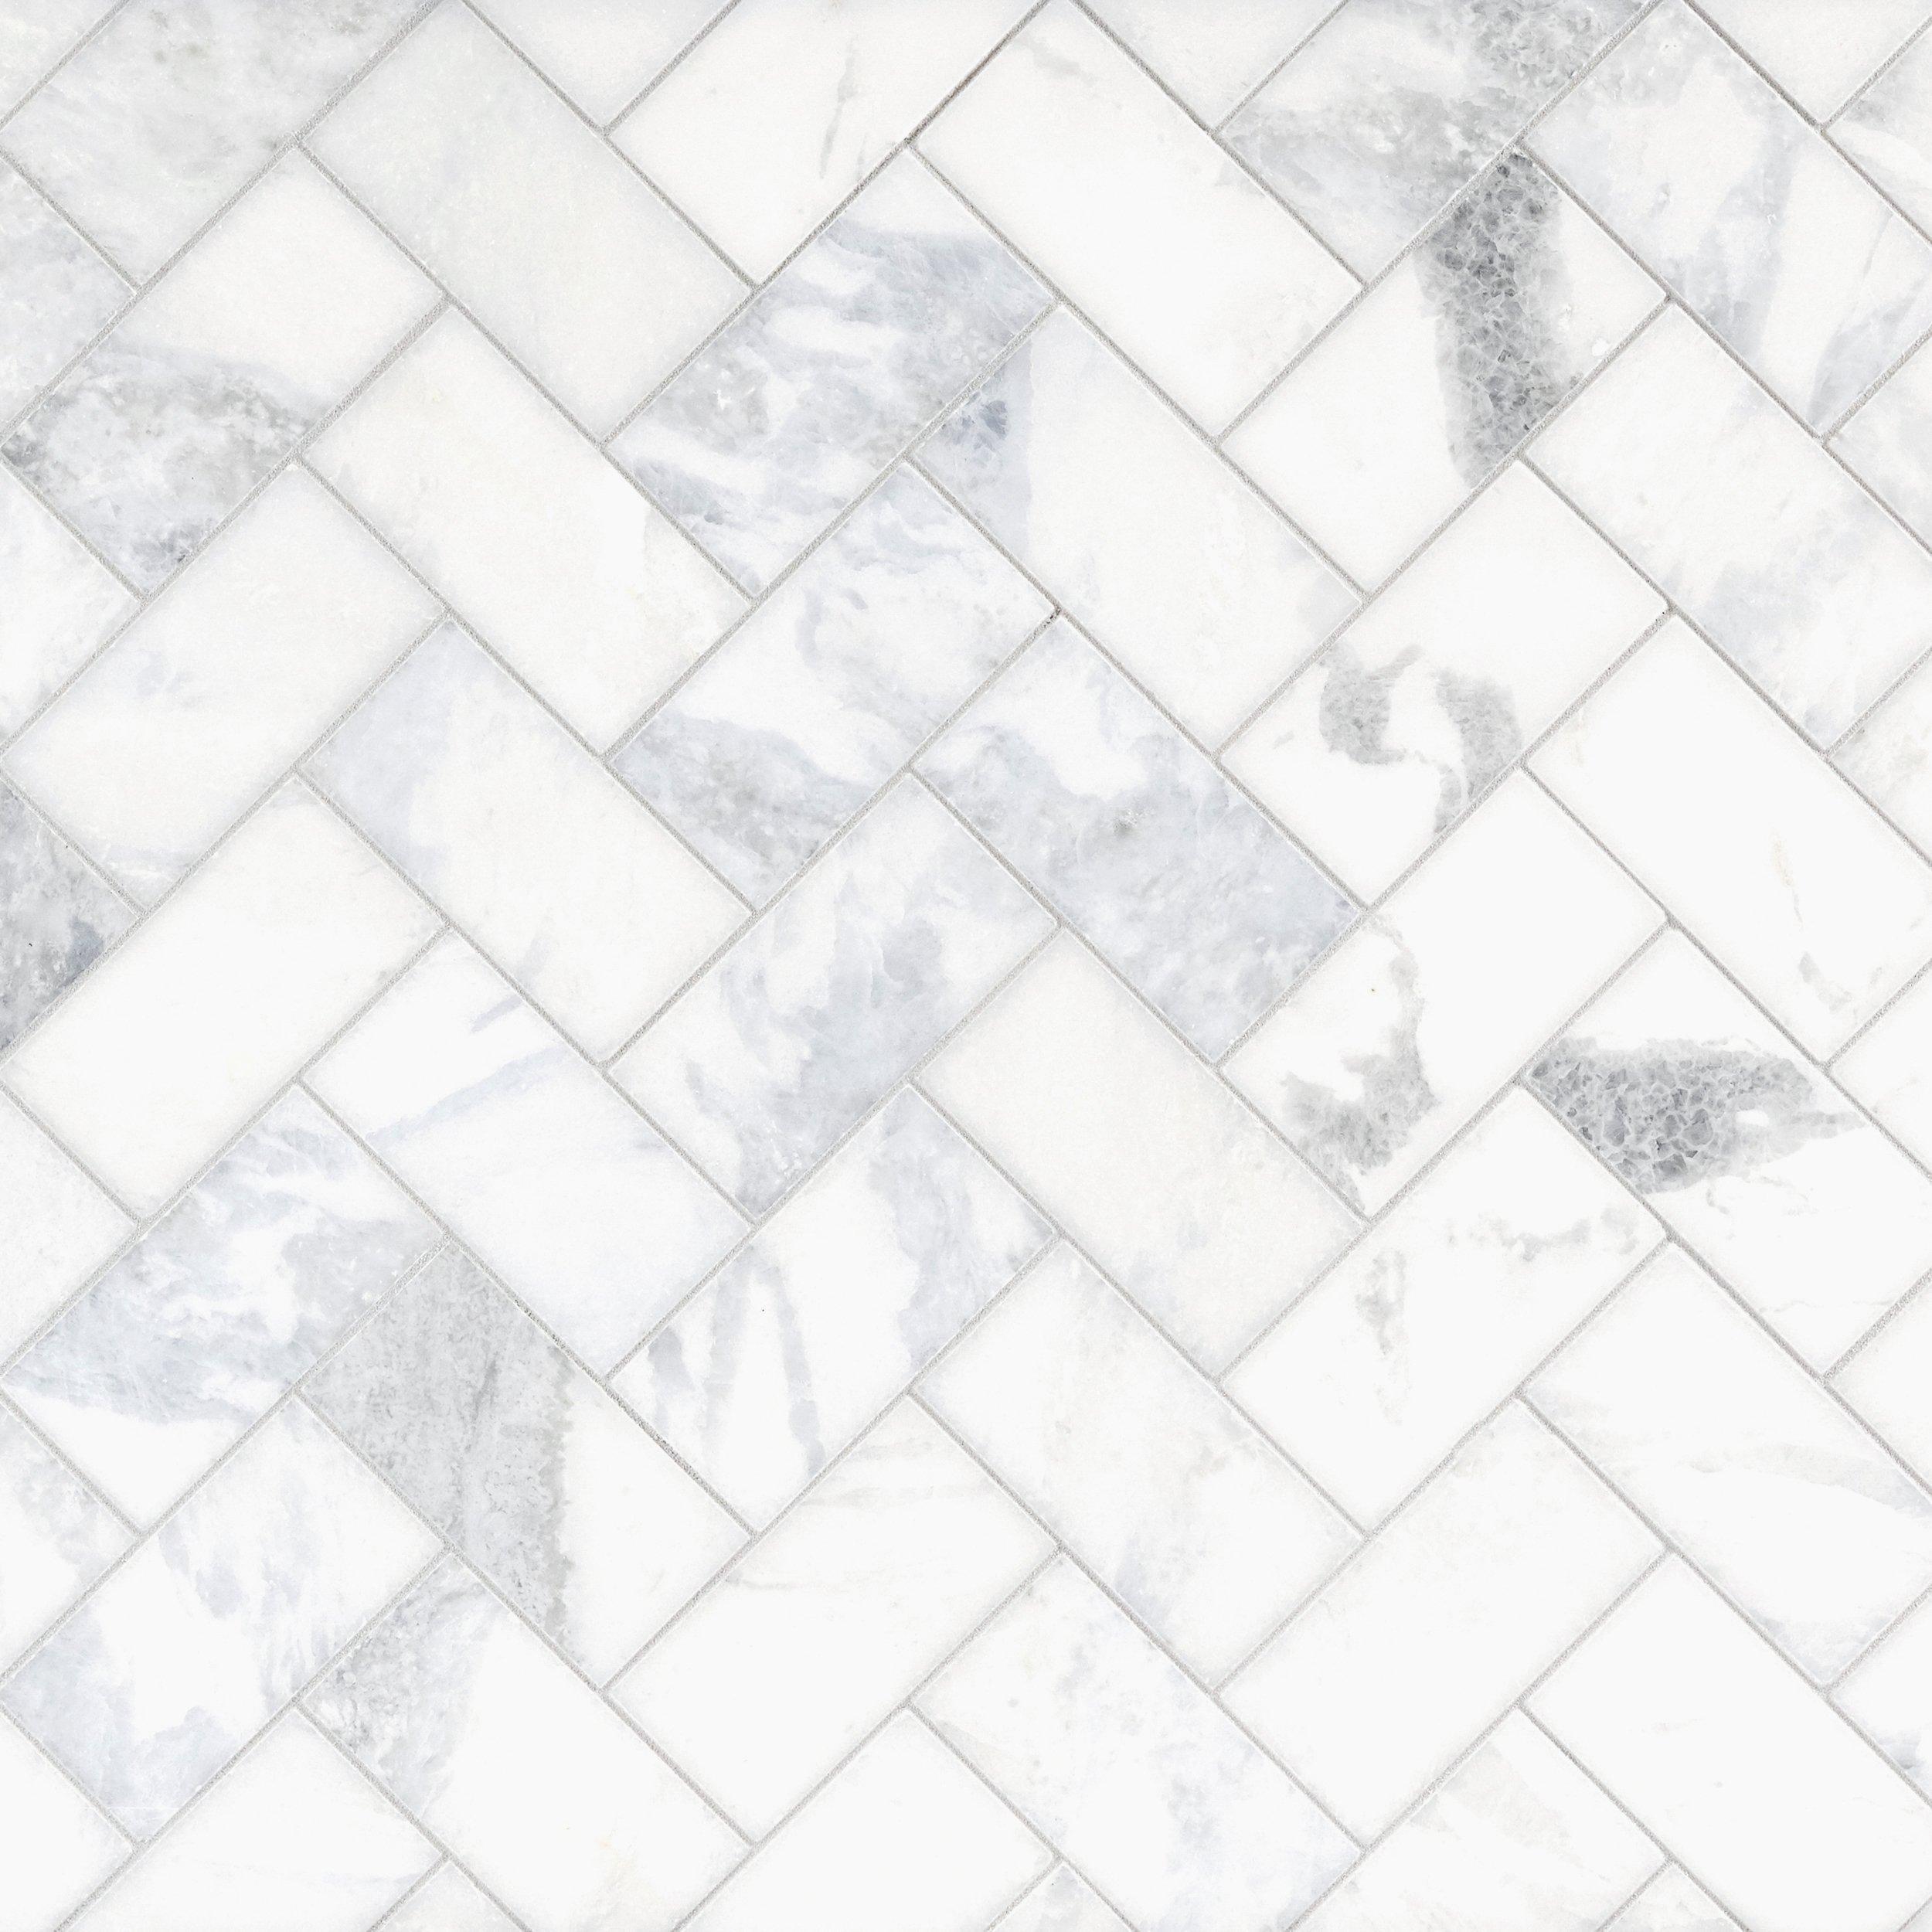 carrara marble tile. Carrara Marble Tile